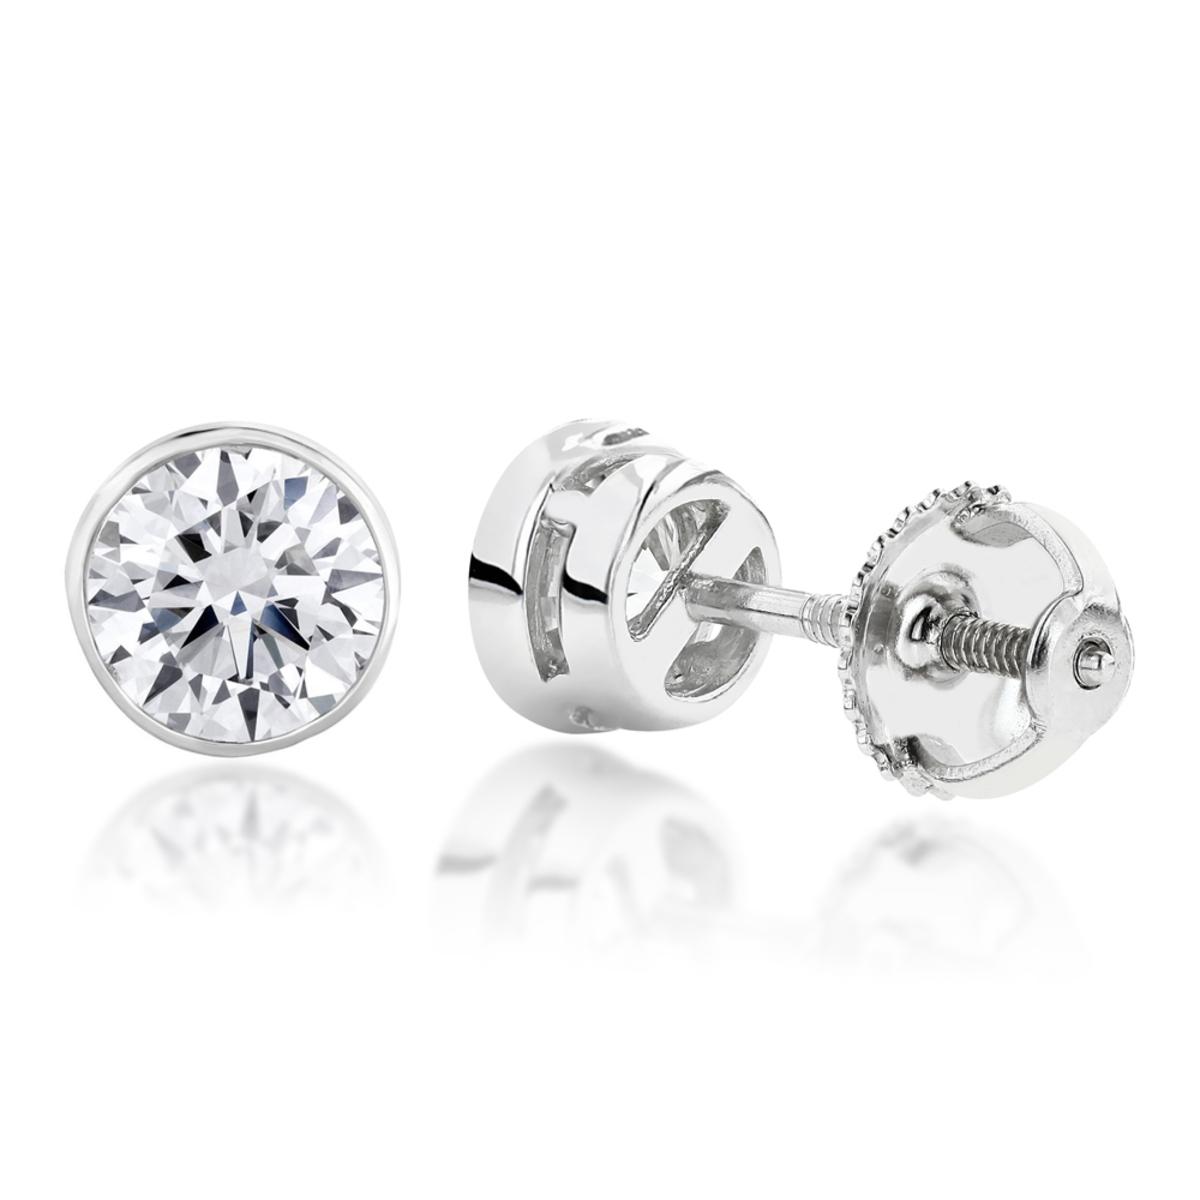 18K Gold Solitaire Round Diamond Bezel Stud Earrings 0.25ct